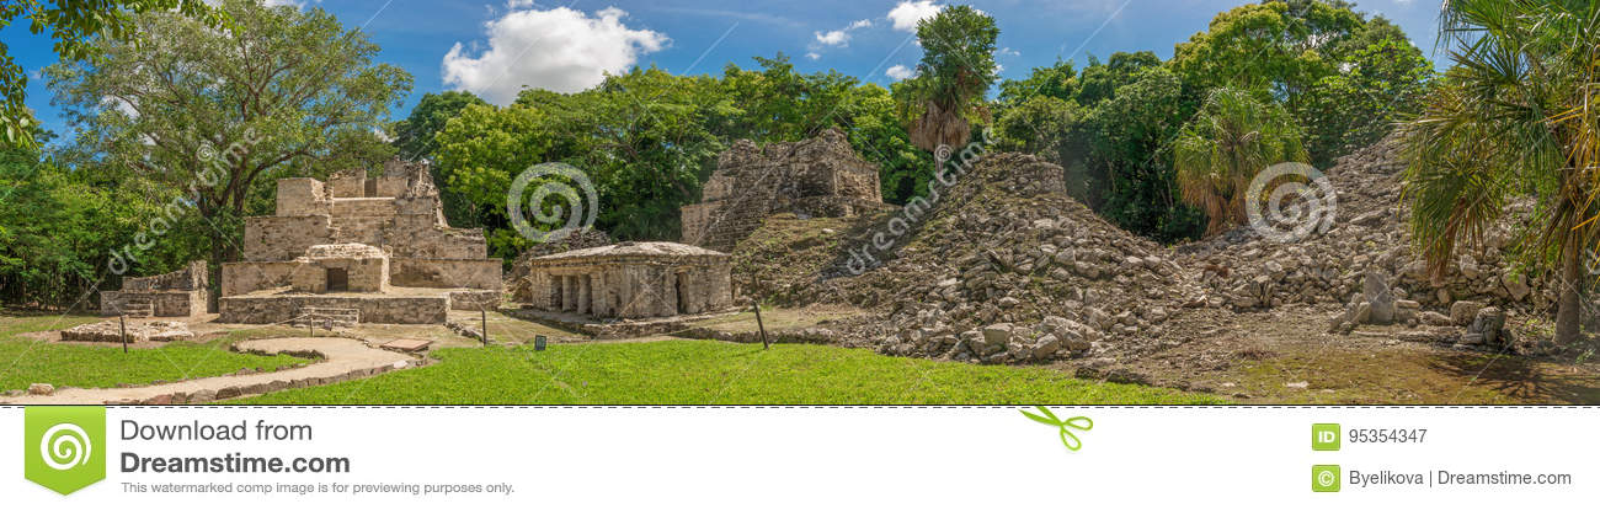 Muyil ancient Maya sites, Yucatan Peninsula in Mexico